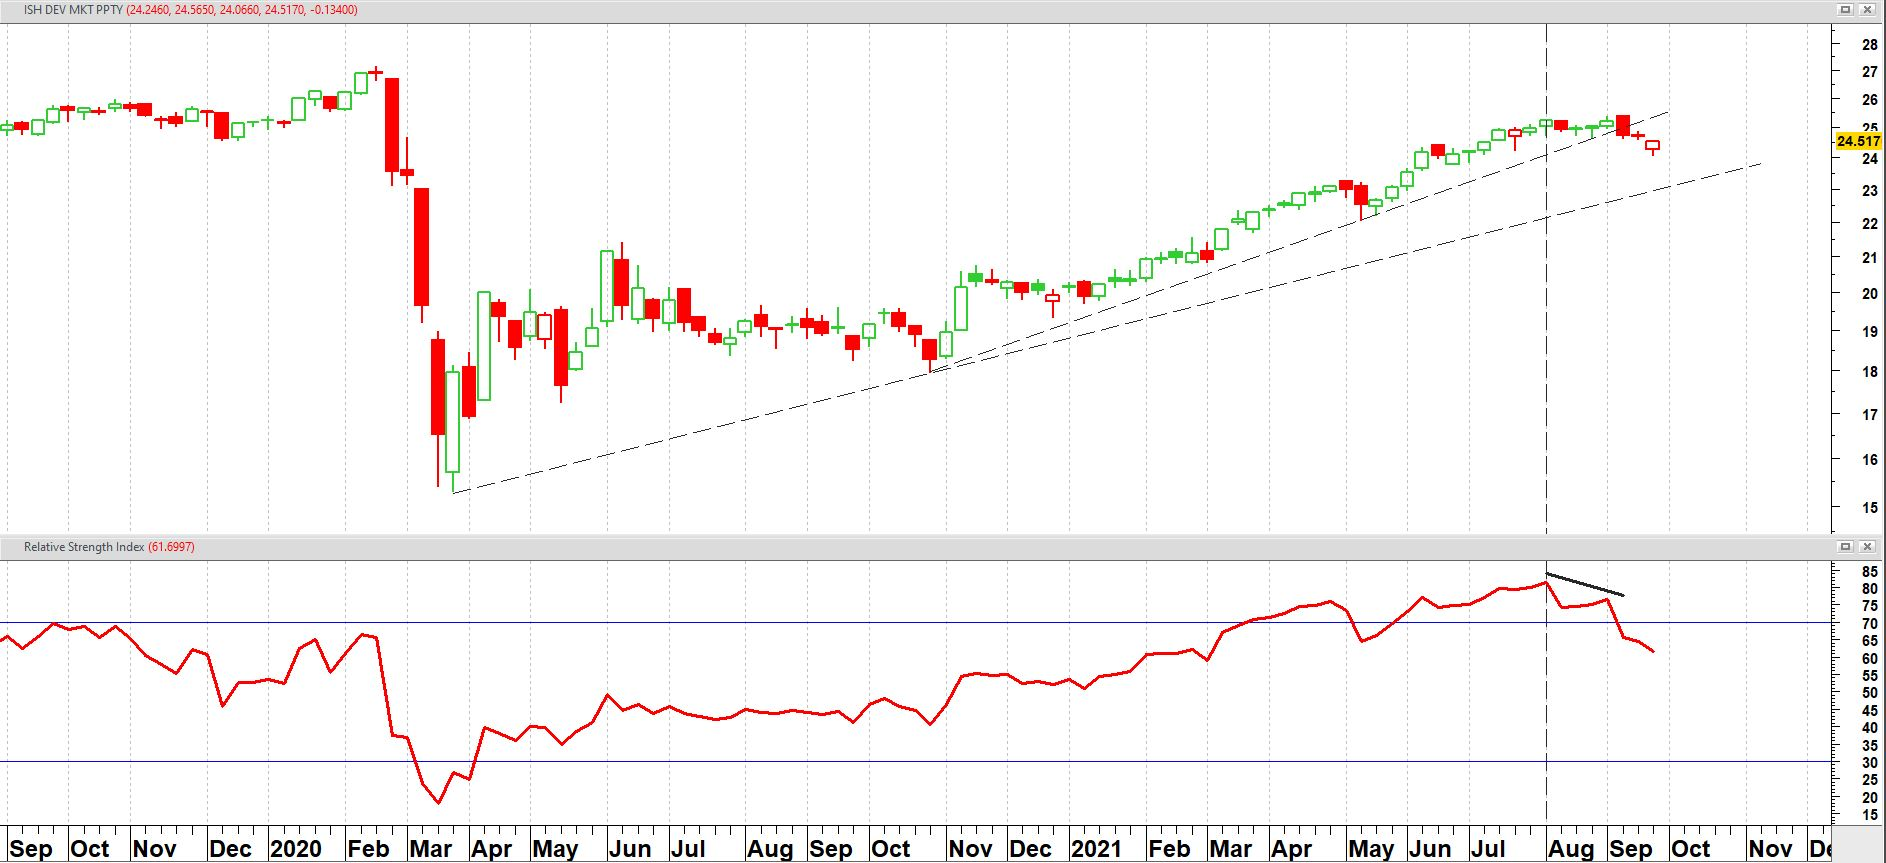 iShares Developed Markets Property Yield UCITS ETF (IWDP) op weekbasis vanaf september 2020